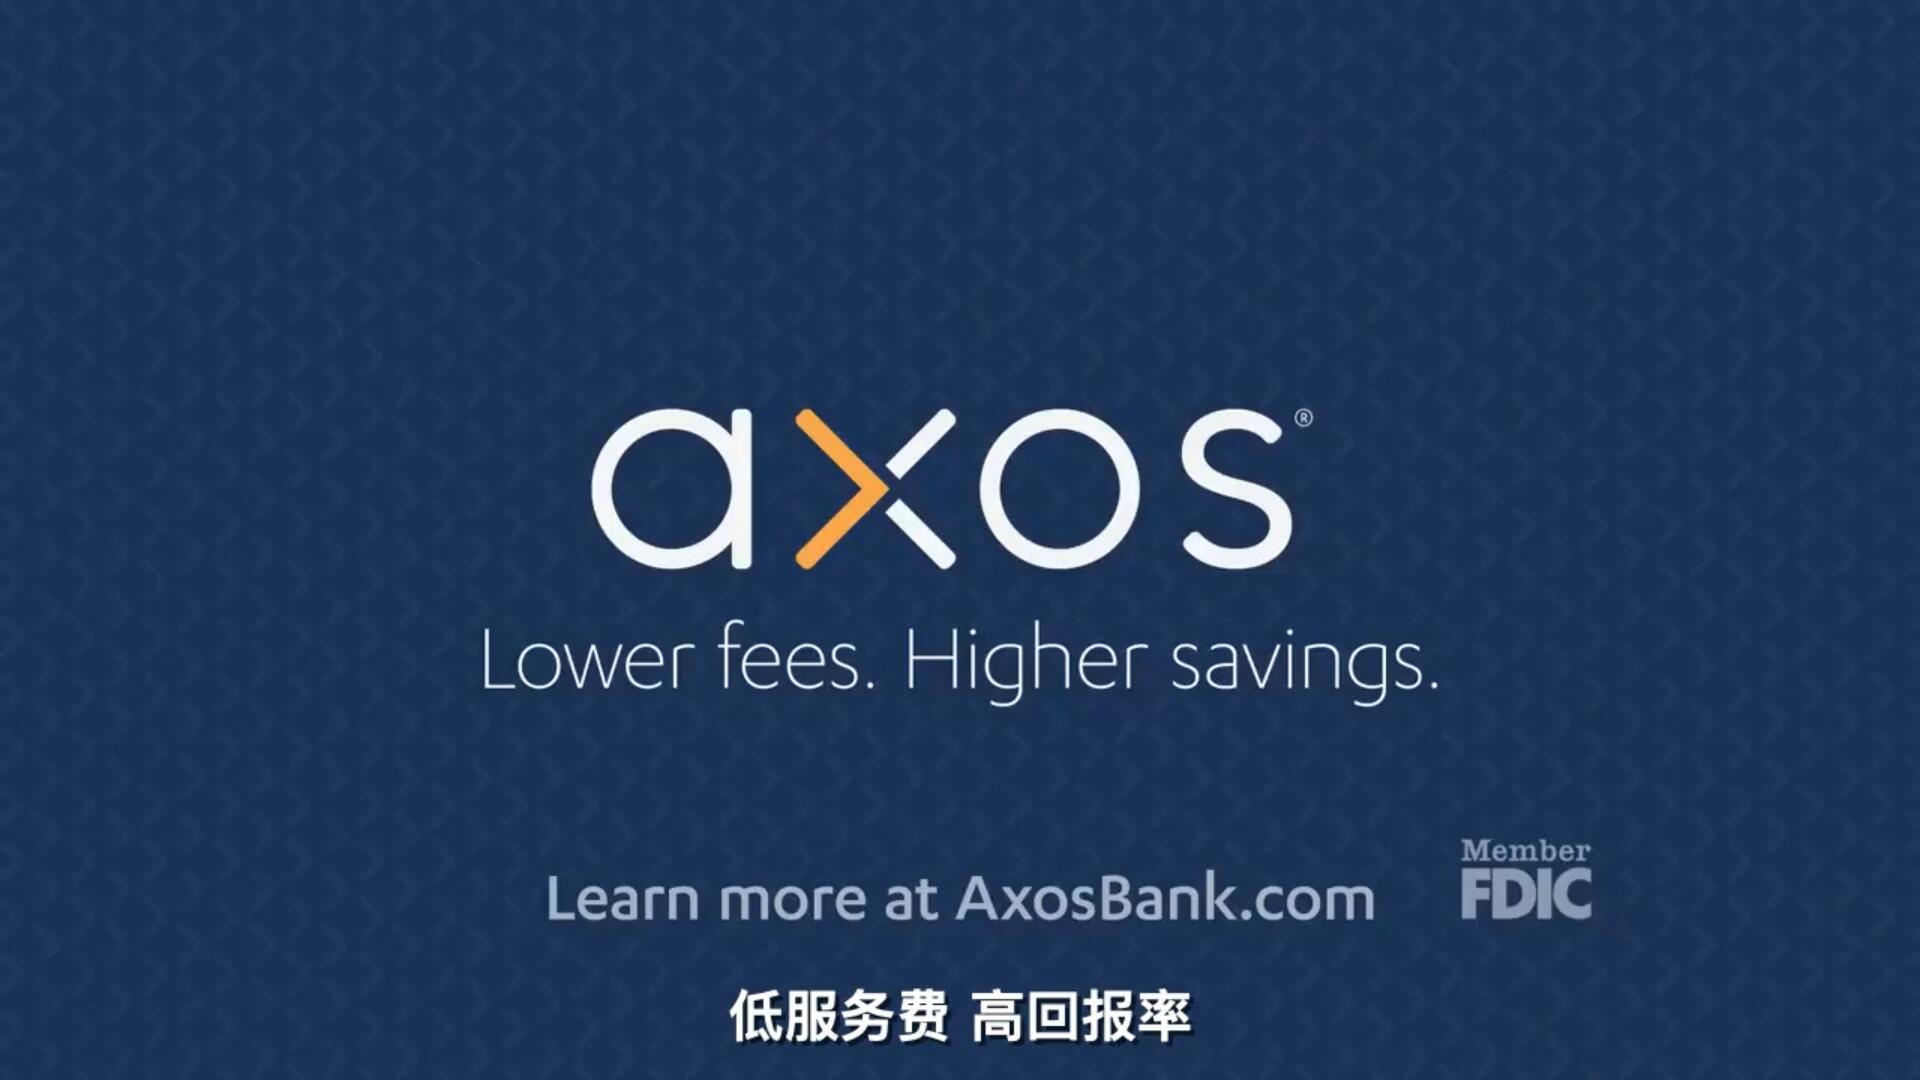 Axos Bank的广告宣传片